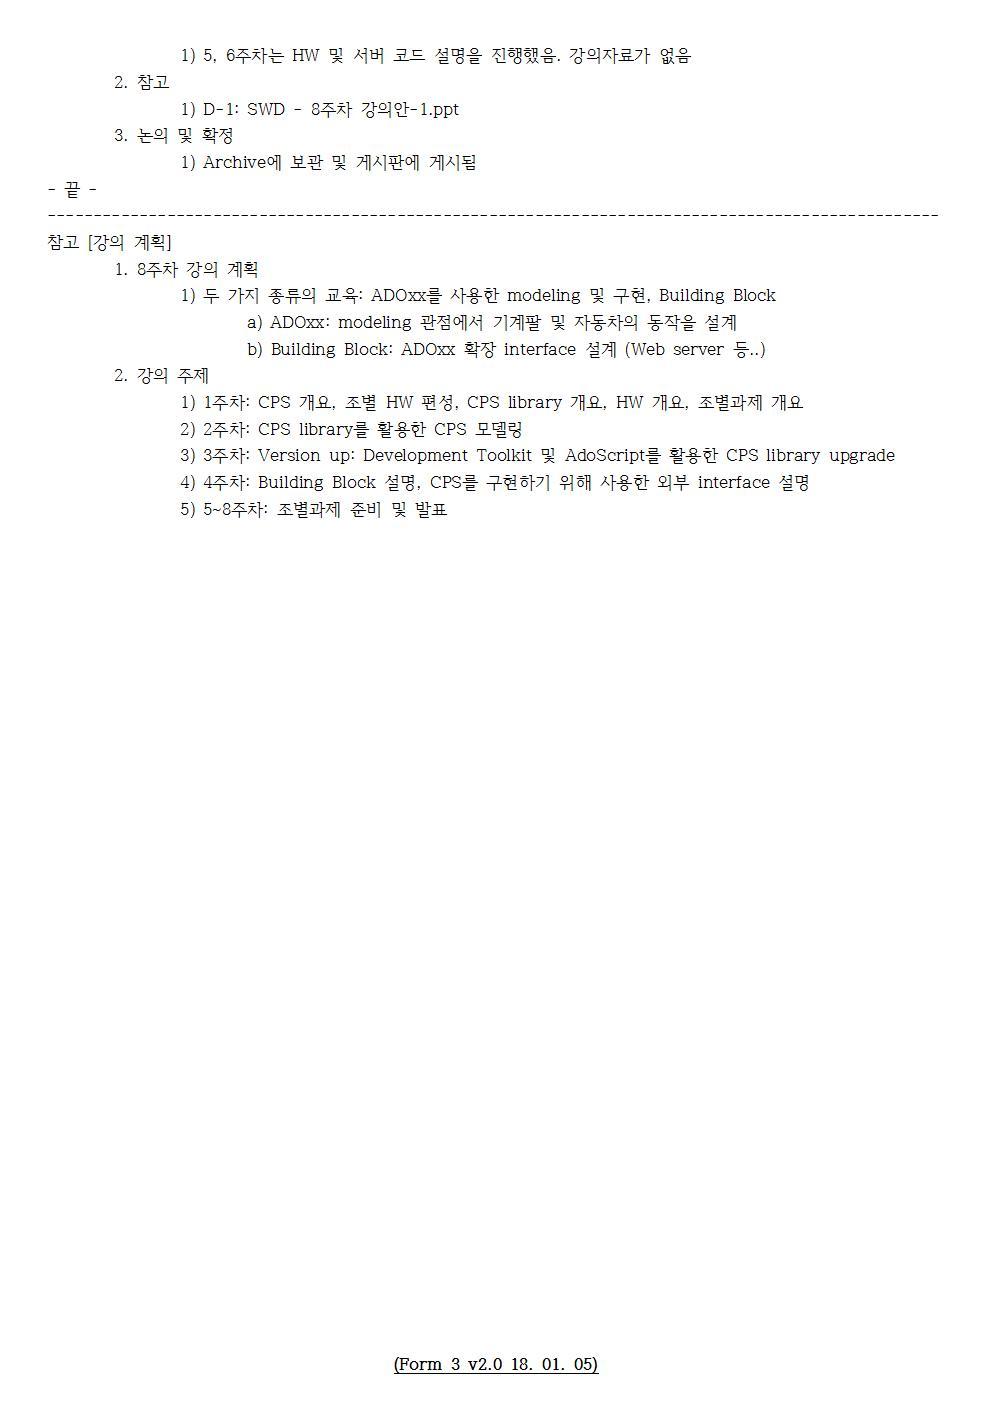 D-[18-040-RC-09]-[SWD-ADOxx Project]-[2018-05-25][SH]002.jpg